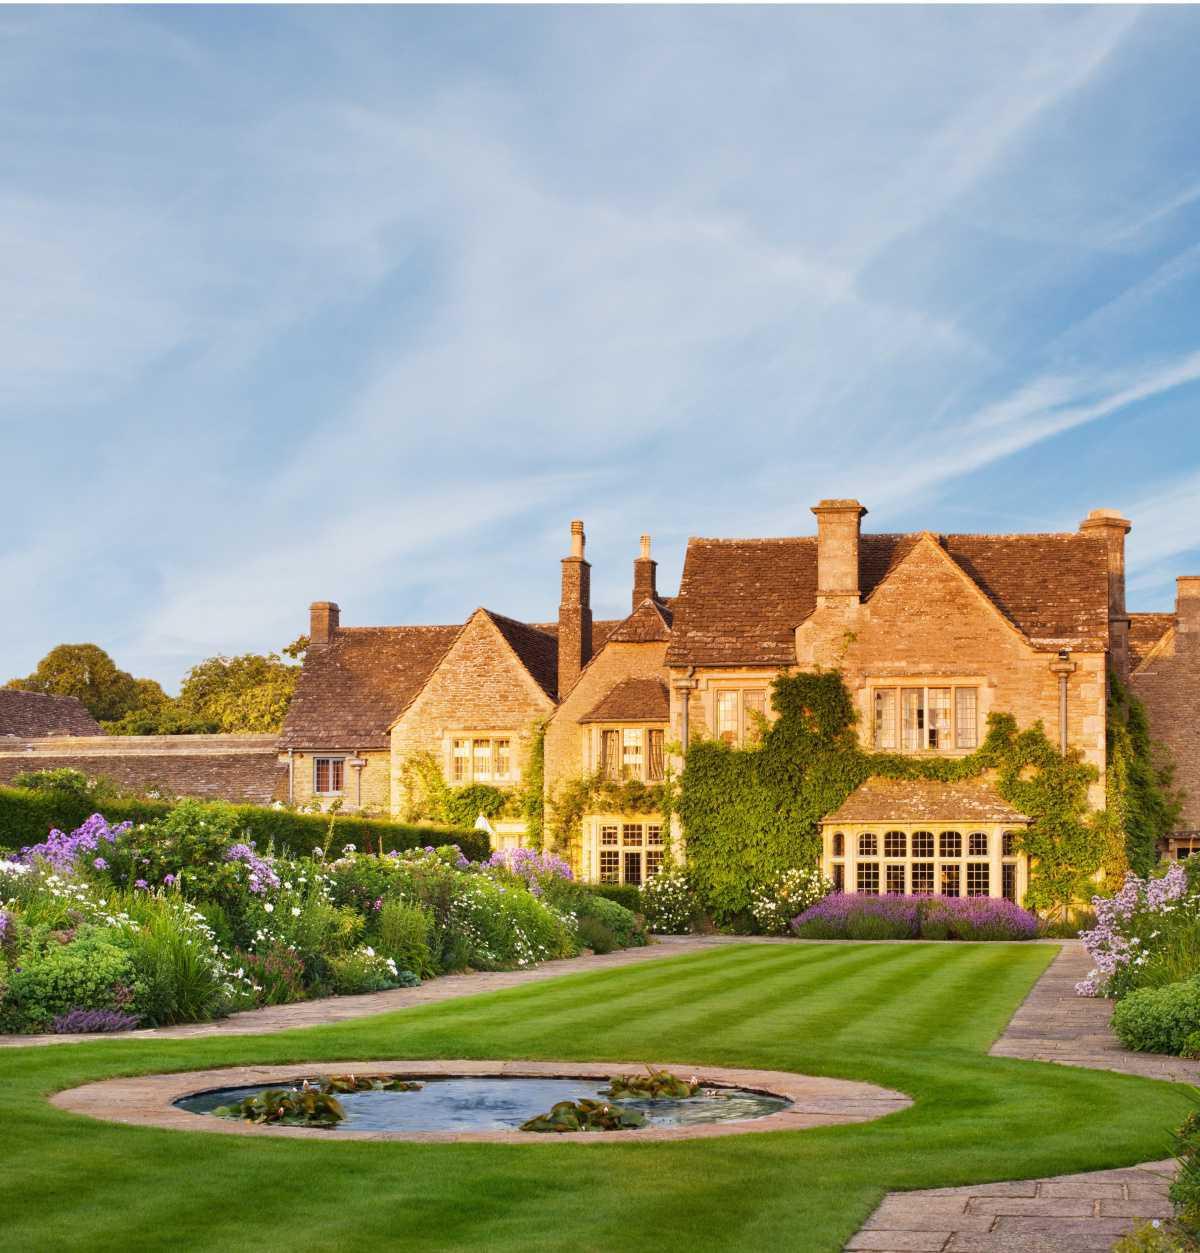 Whatley Manor